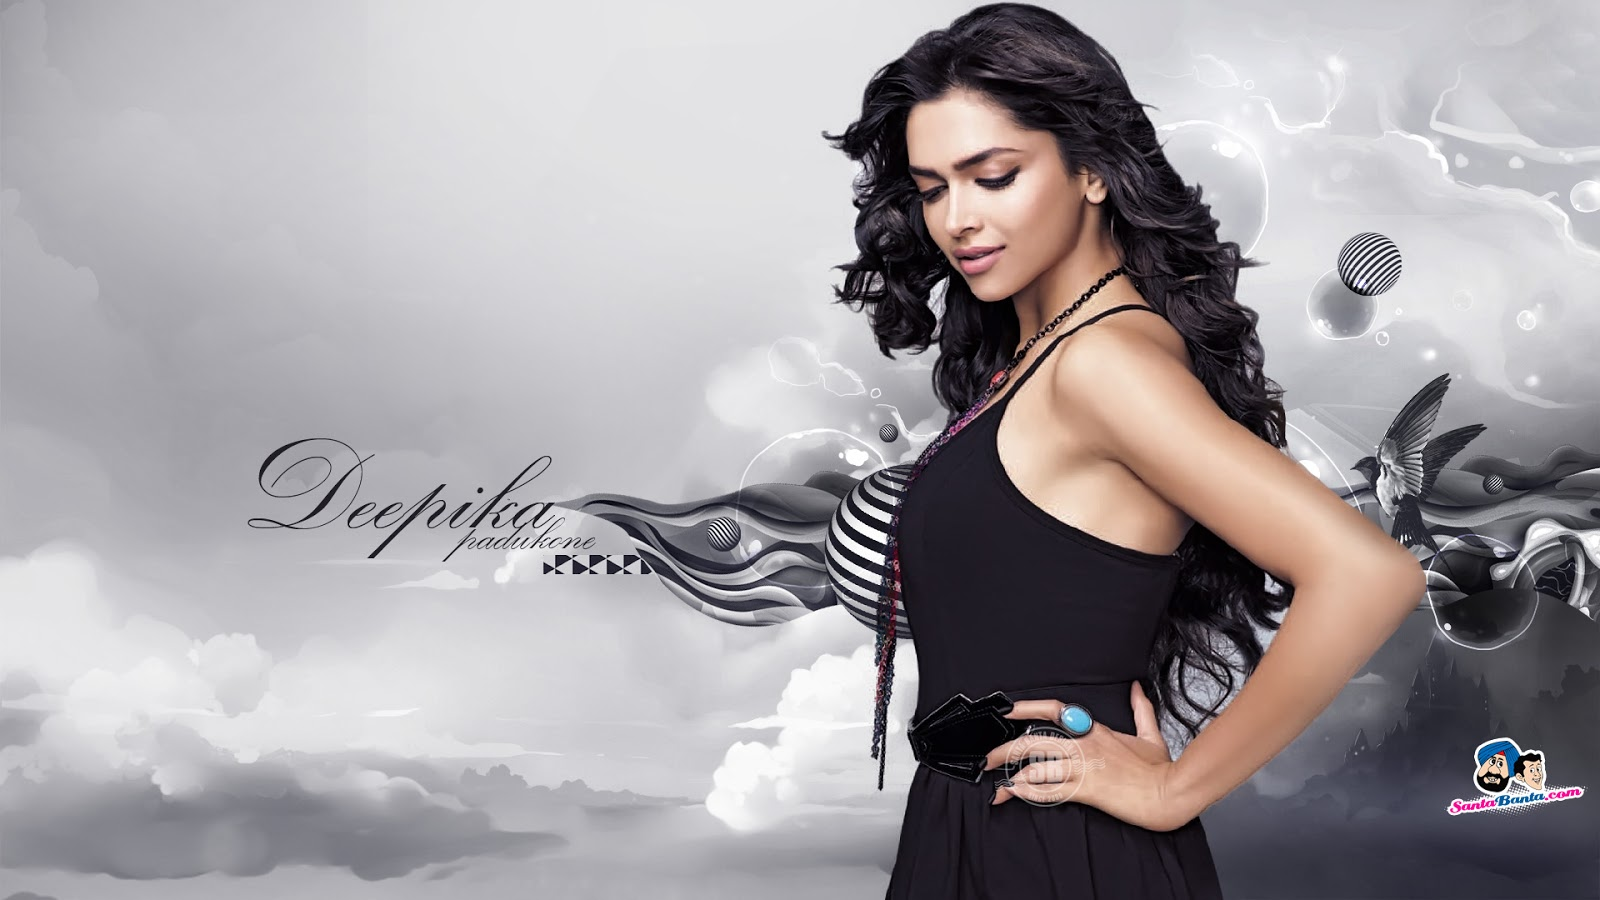 Hotpics4male: Deepika Padukone Hot Sexy Free Picture